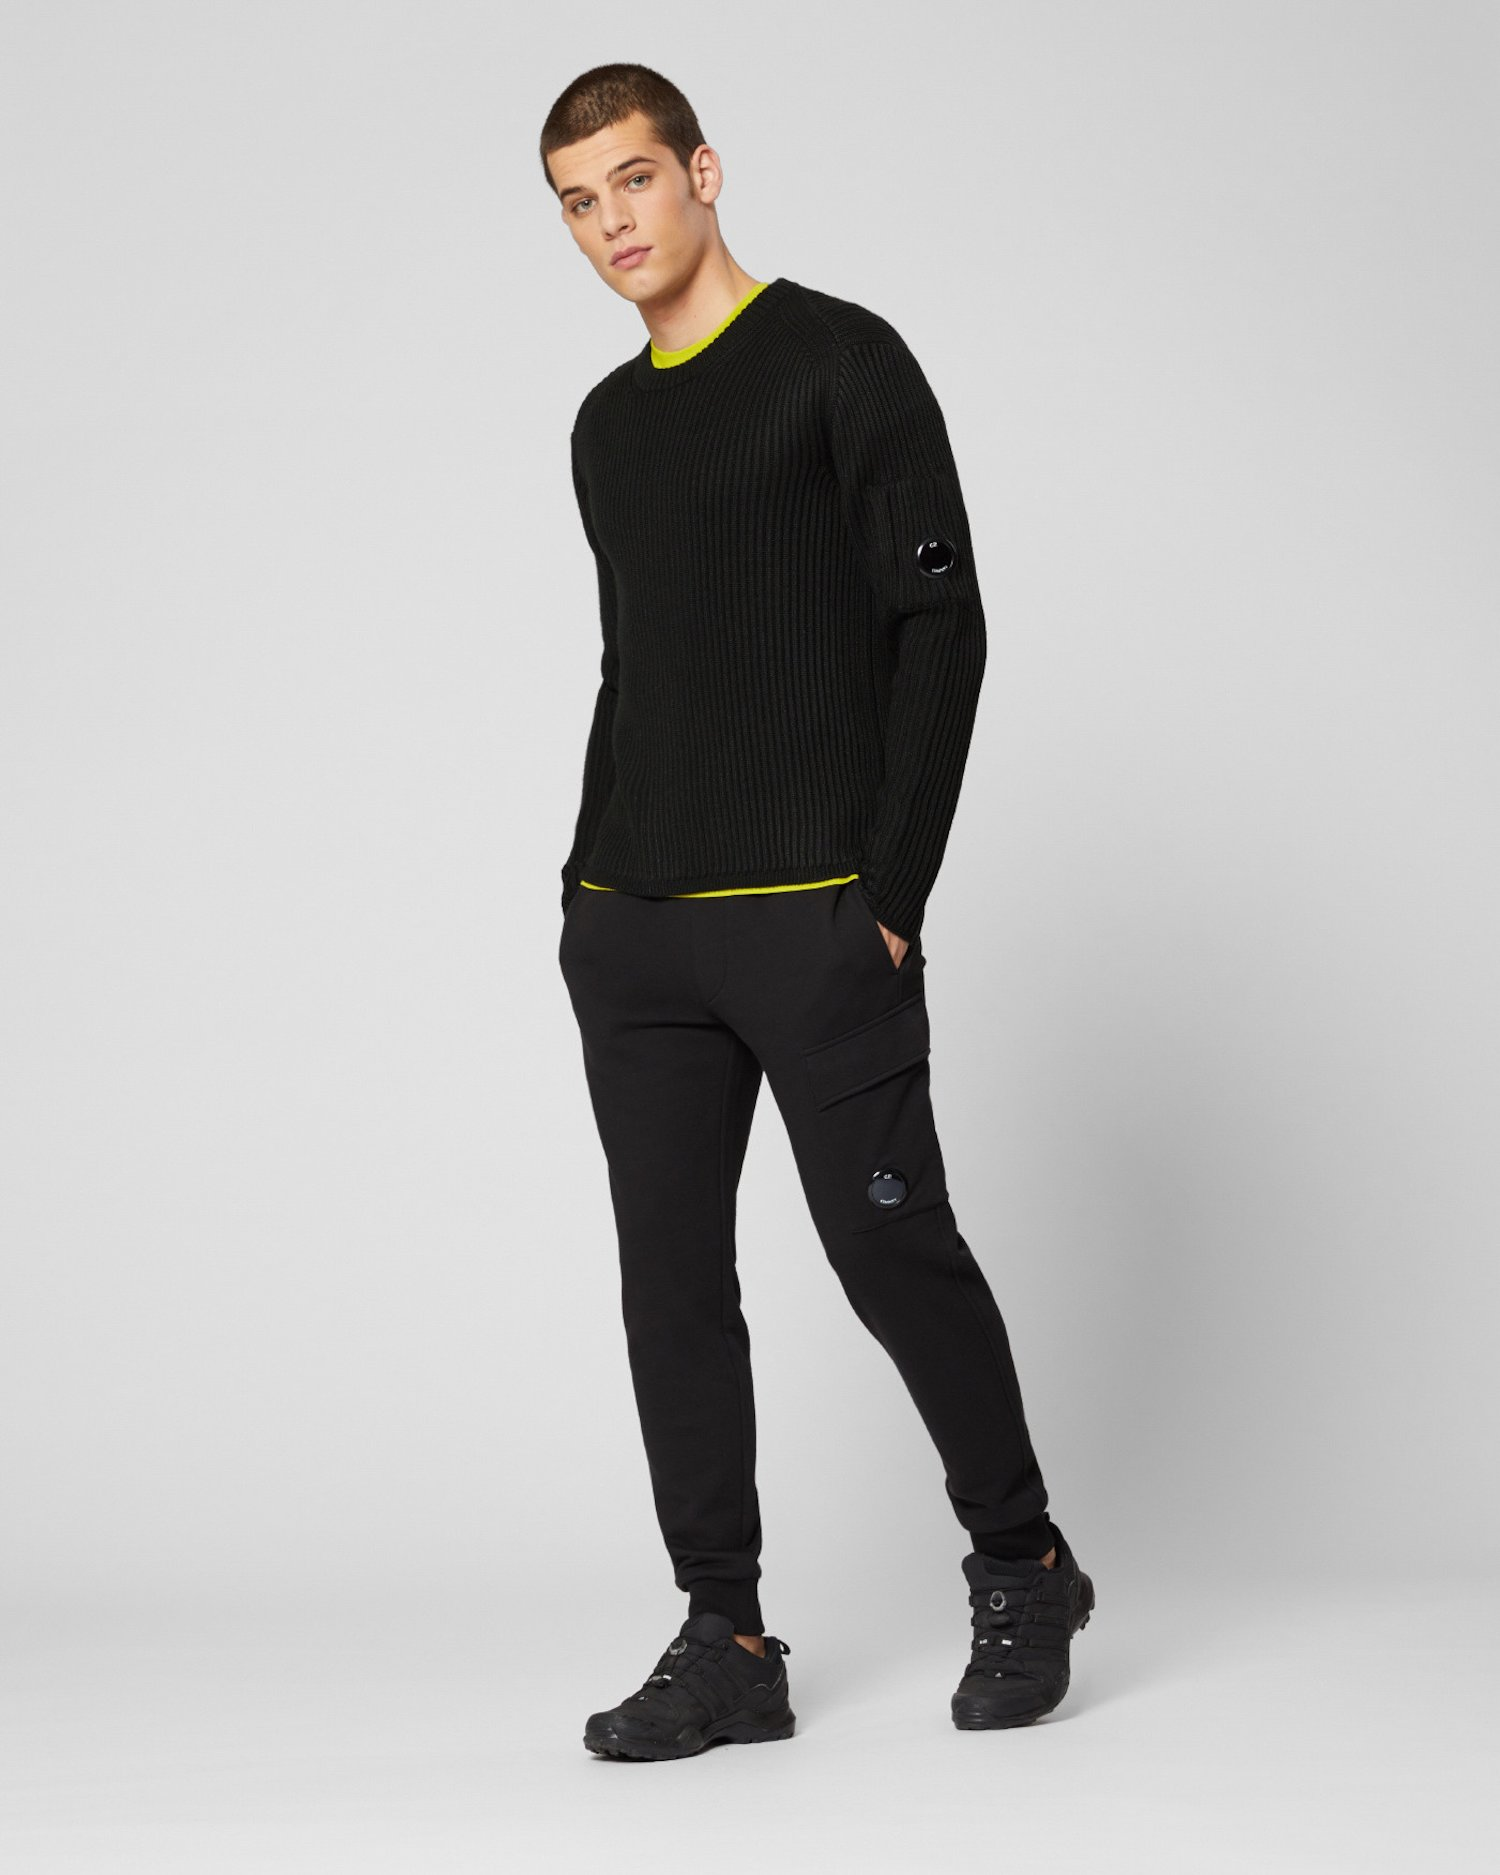 Merino Wool Ribbed Lens Sweater